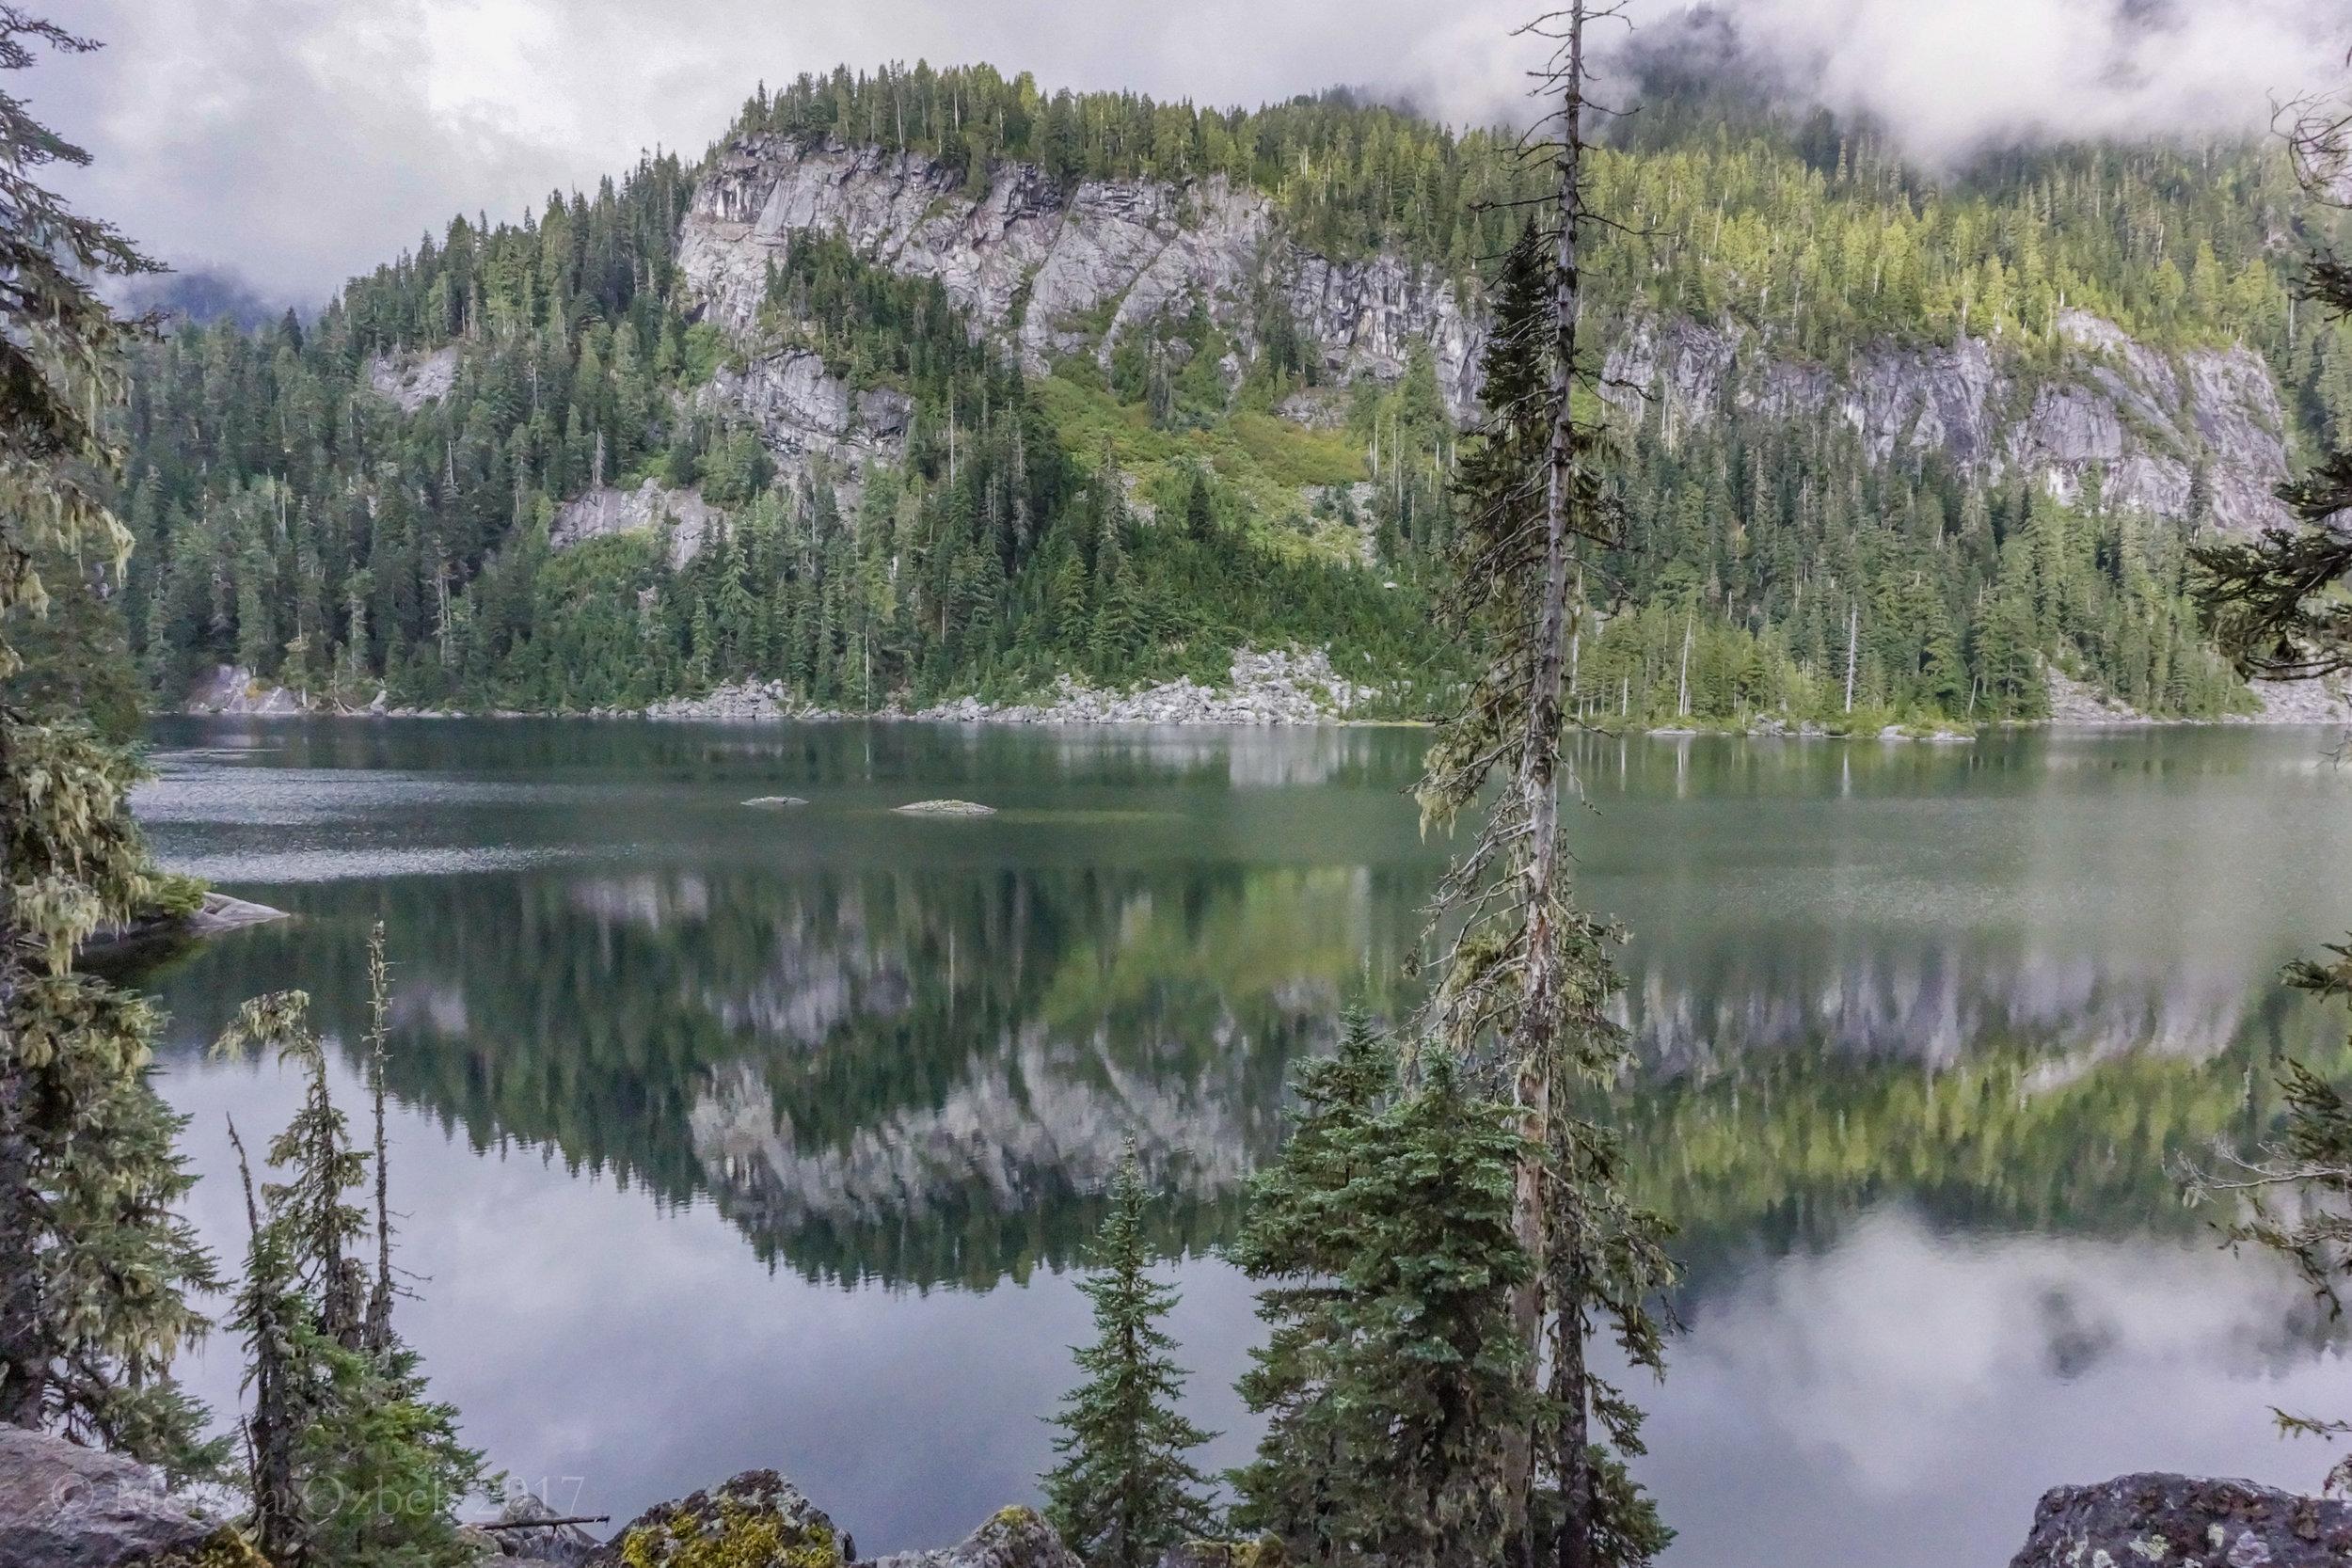 10. Lake Dorothy